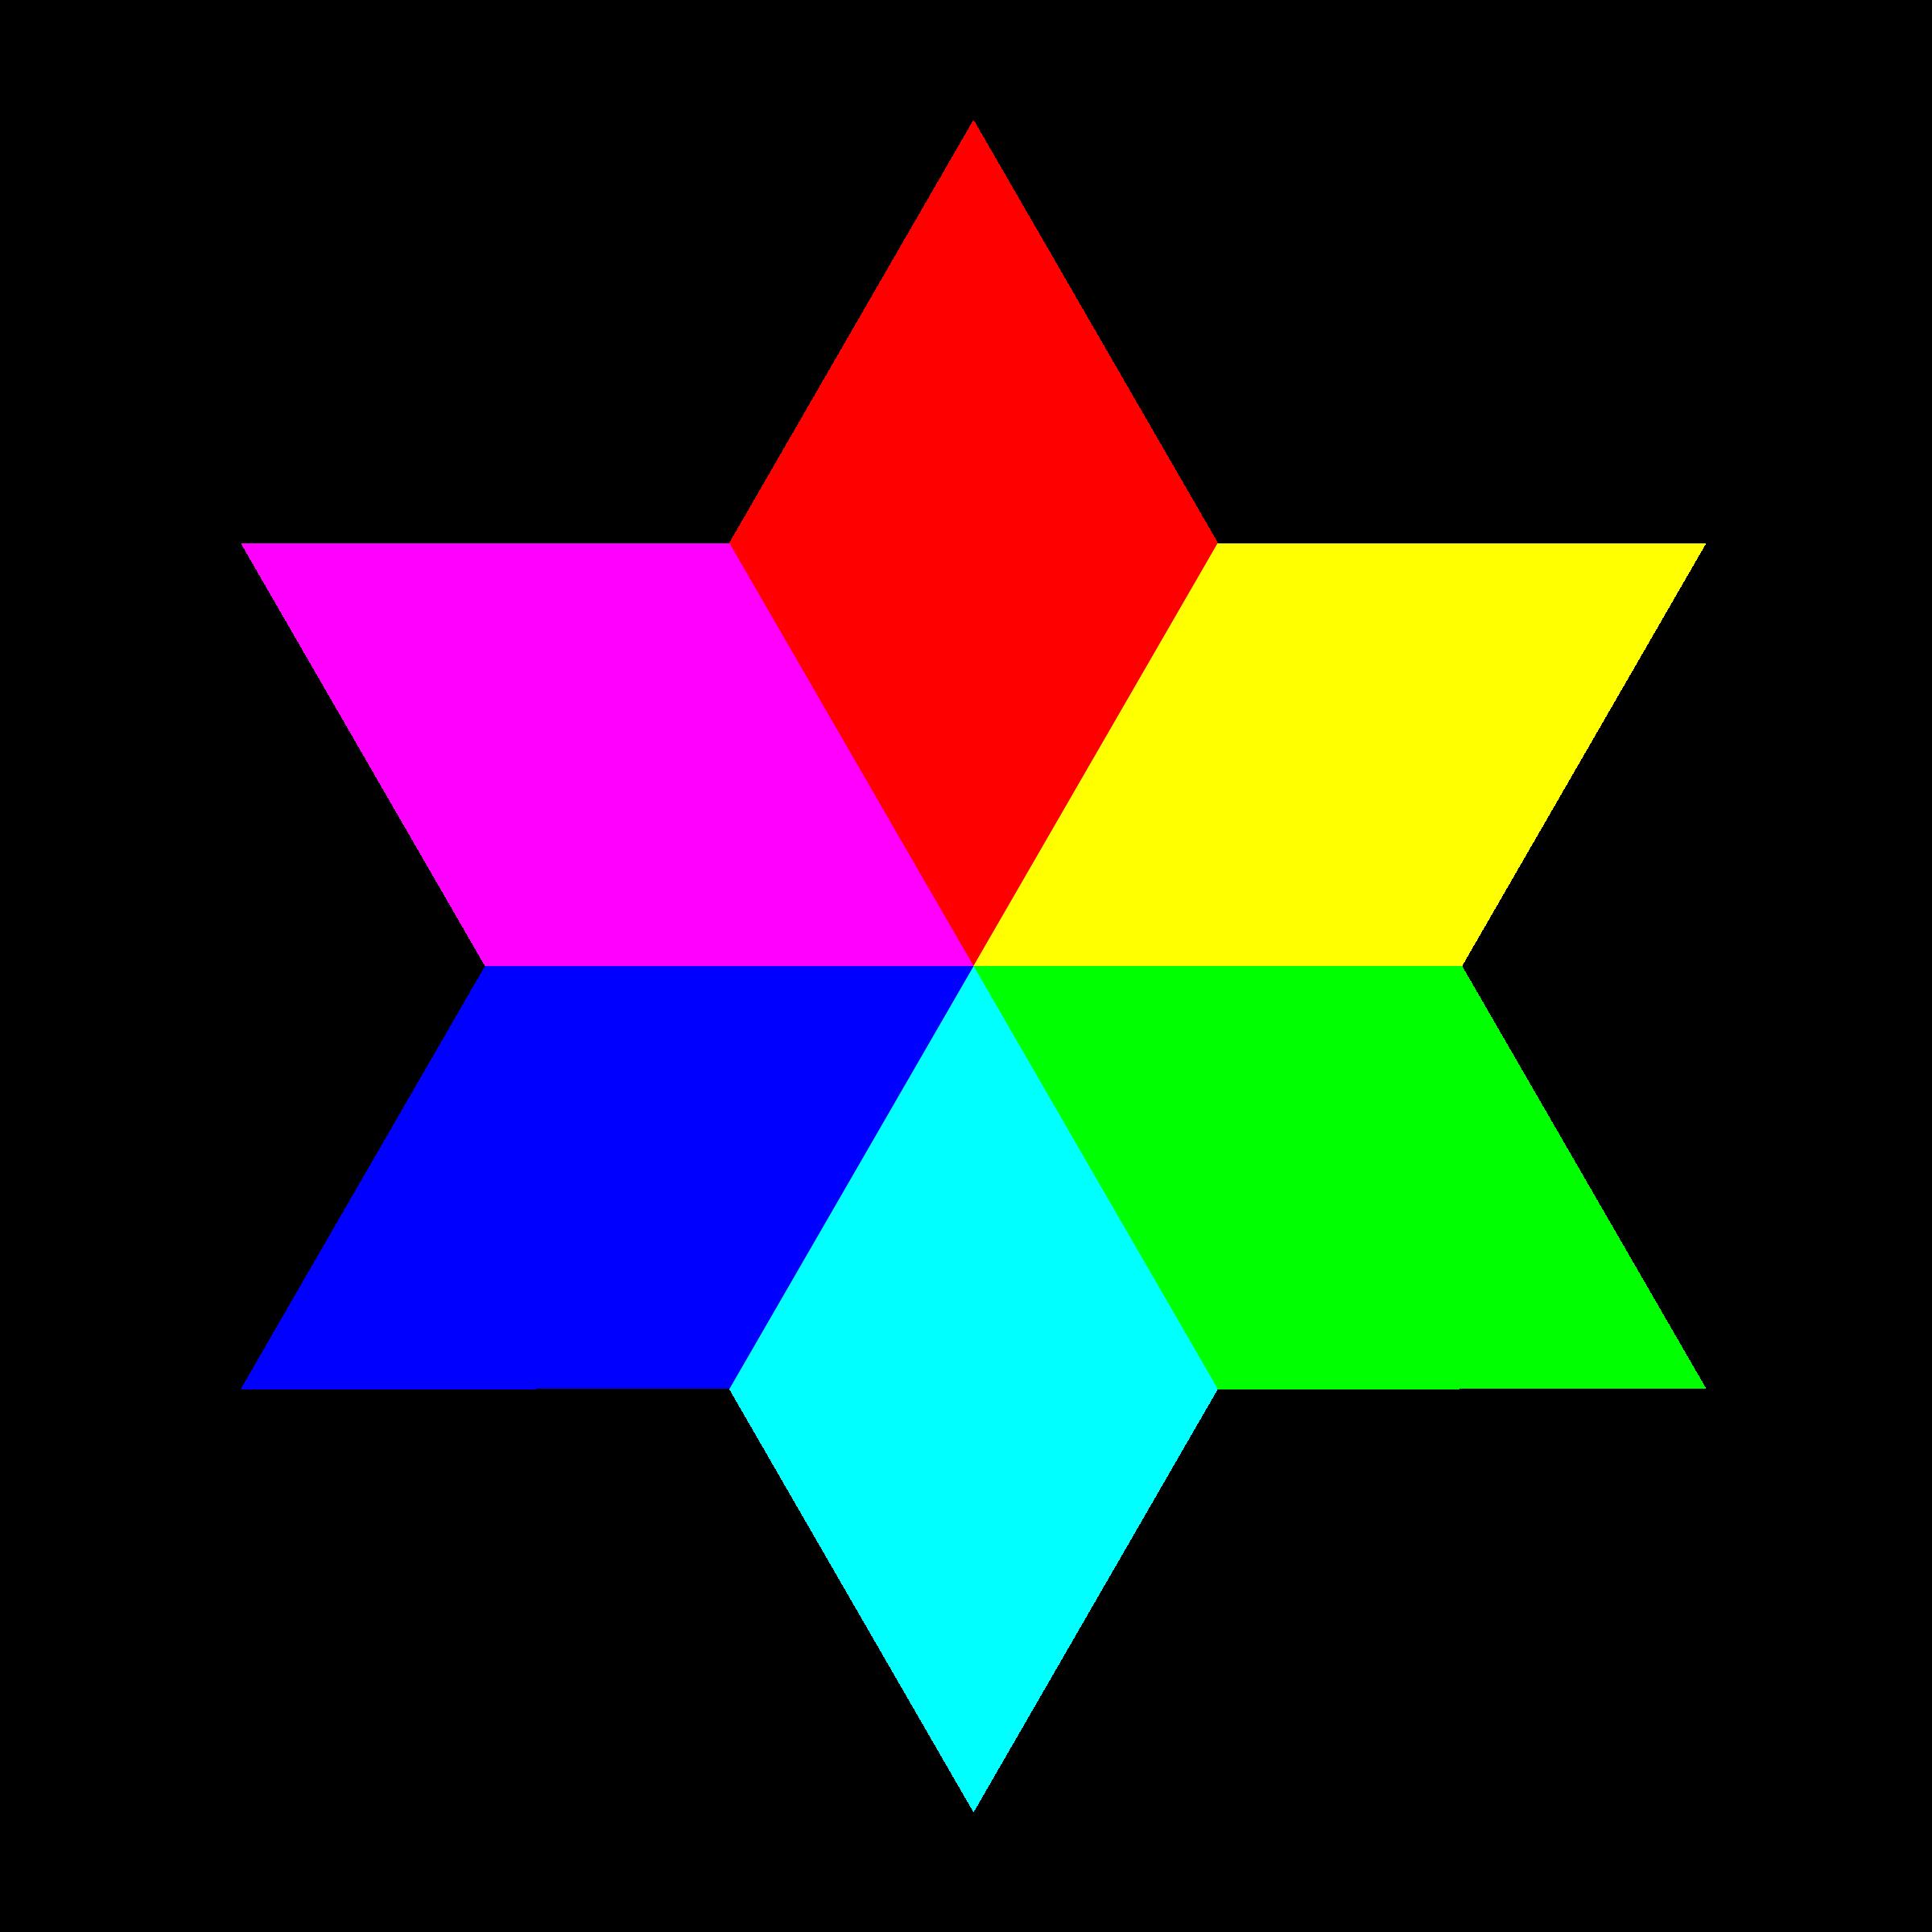 Clipart diamond logo. Color hexagram big image